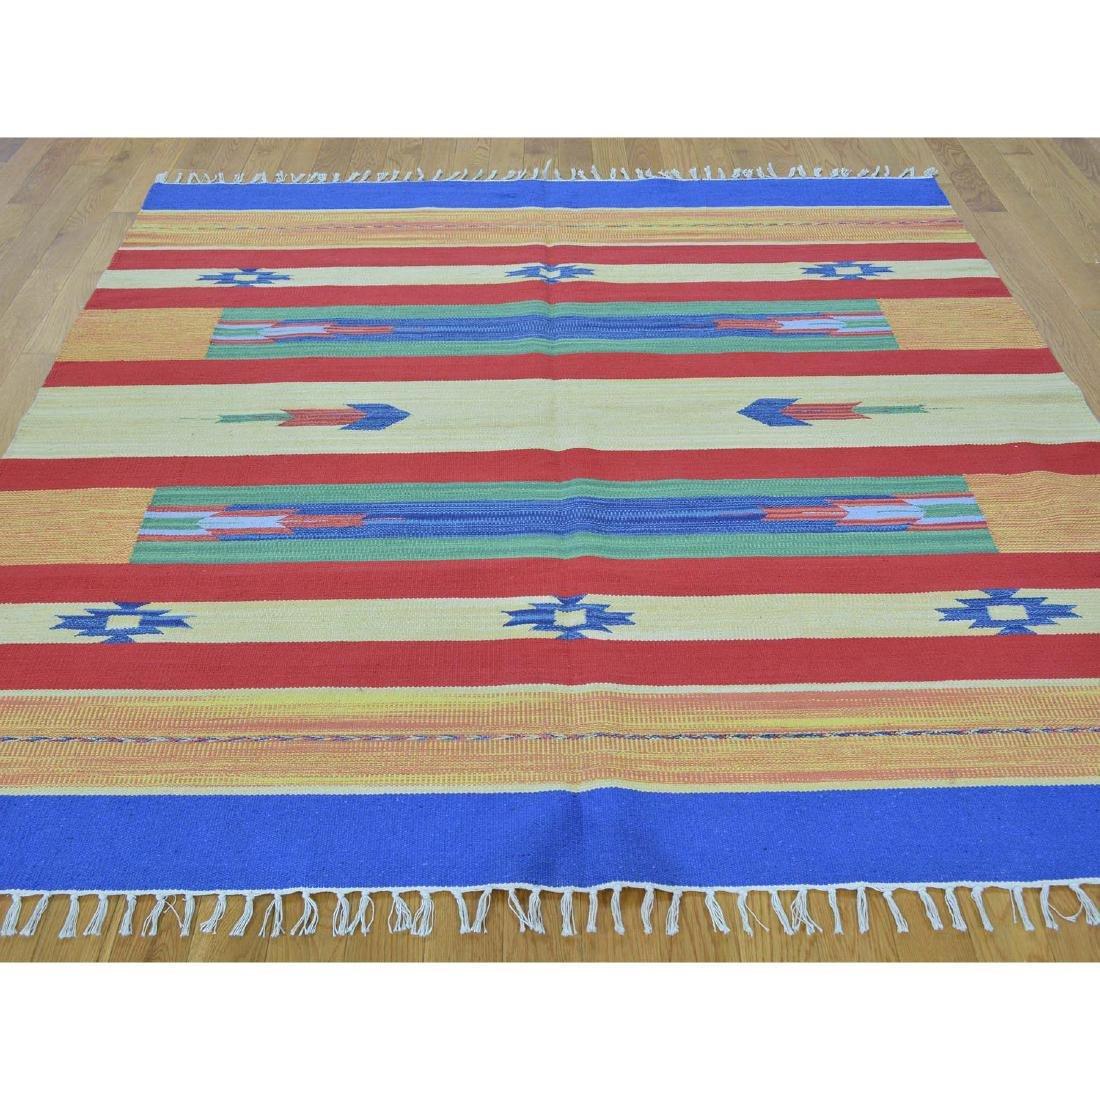 Flat Weave Kilim Hand Woven Navajo Design Rug 6x6.1 - 2